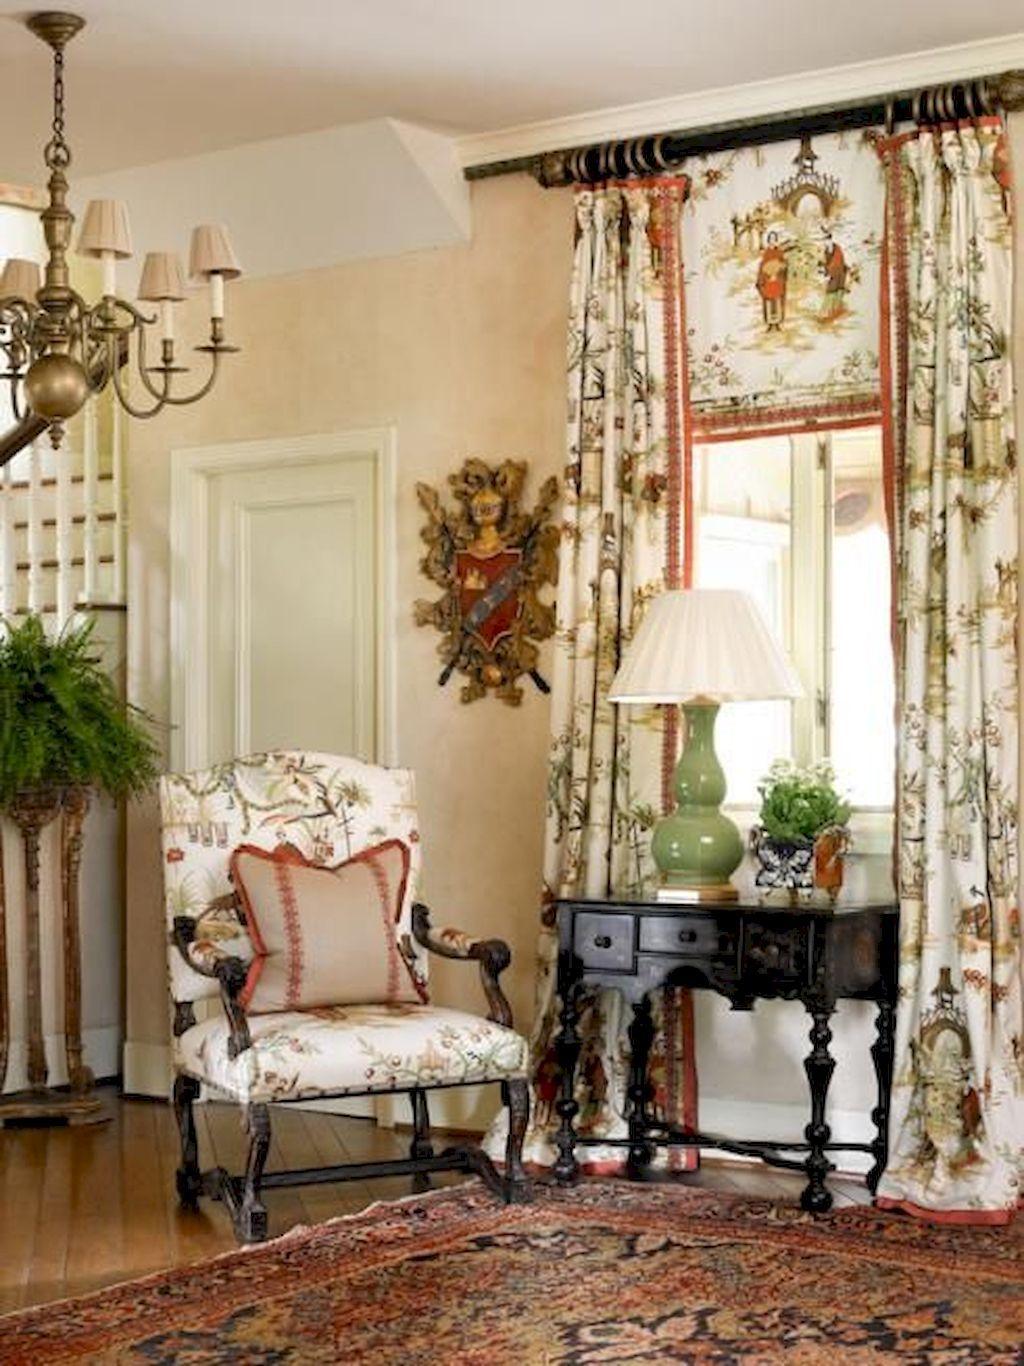 30 Spectacular French Country Cottage Decor Ideas En 2020 Style Deco Decoration Interieure Decoration Maison